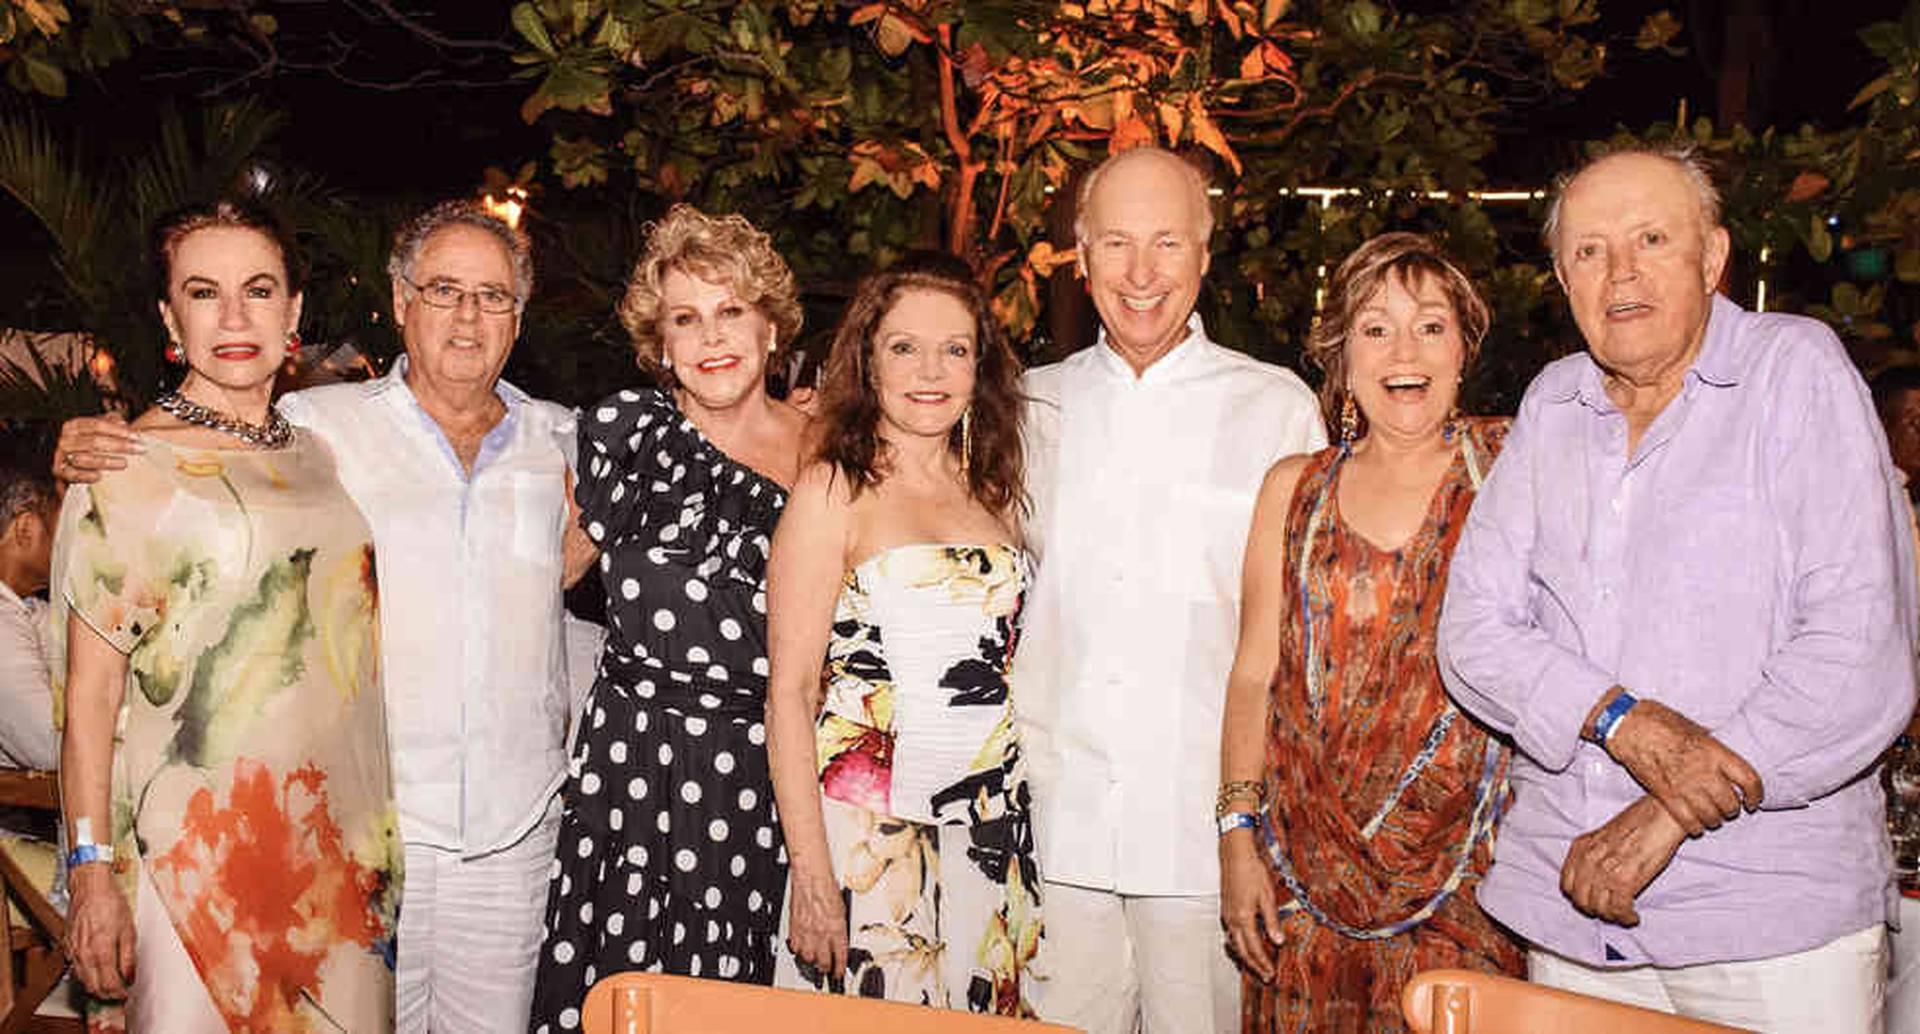 Esther Ventura, Eduardo Vargas, Gladys Richard de Vargas, Pilar Román de Ayerbe, Rosario Díaz-Granados y Ramiro Escobar.